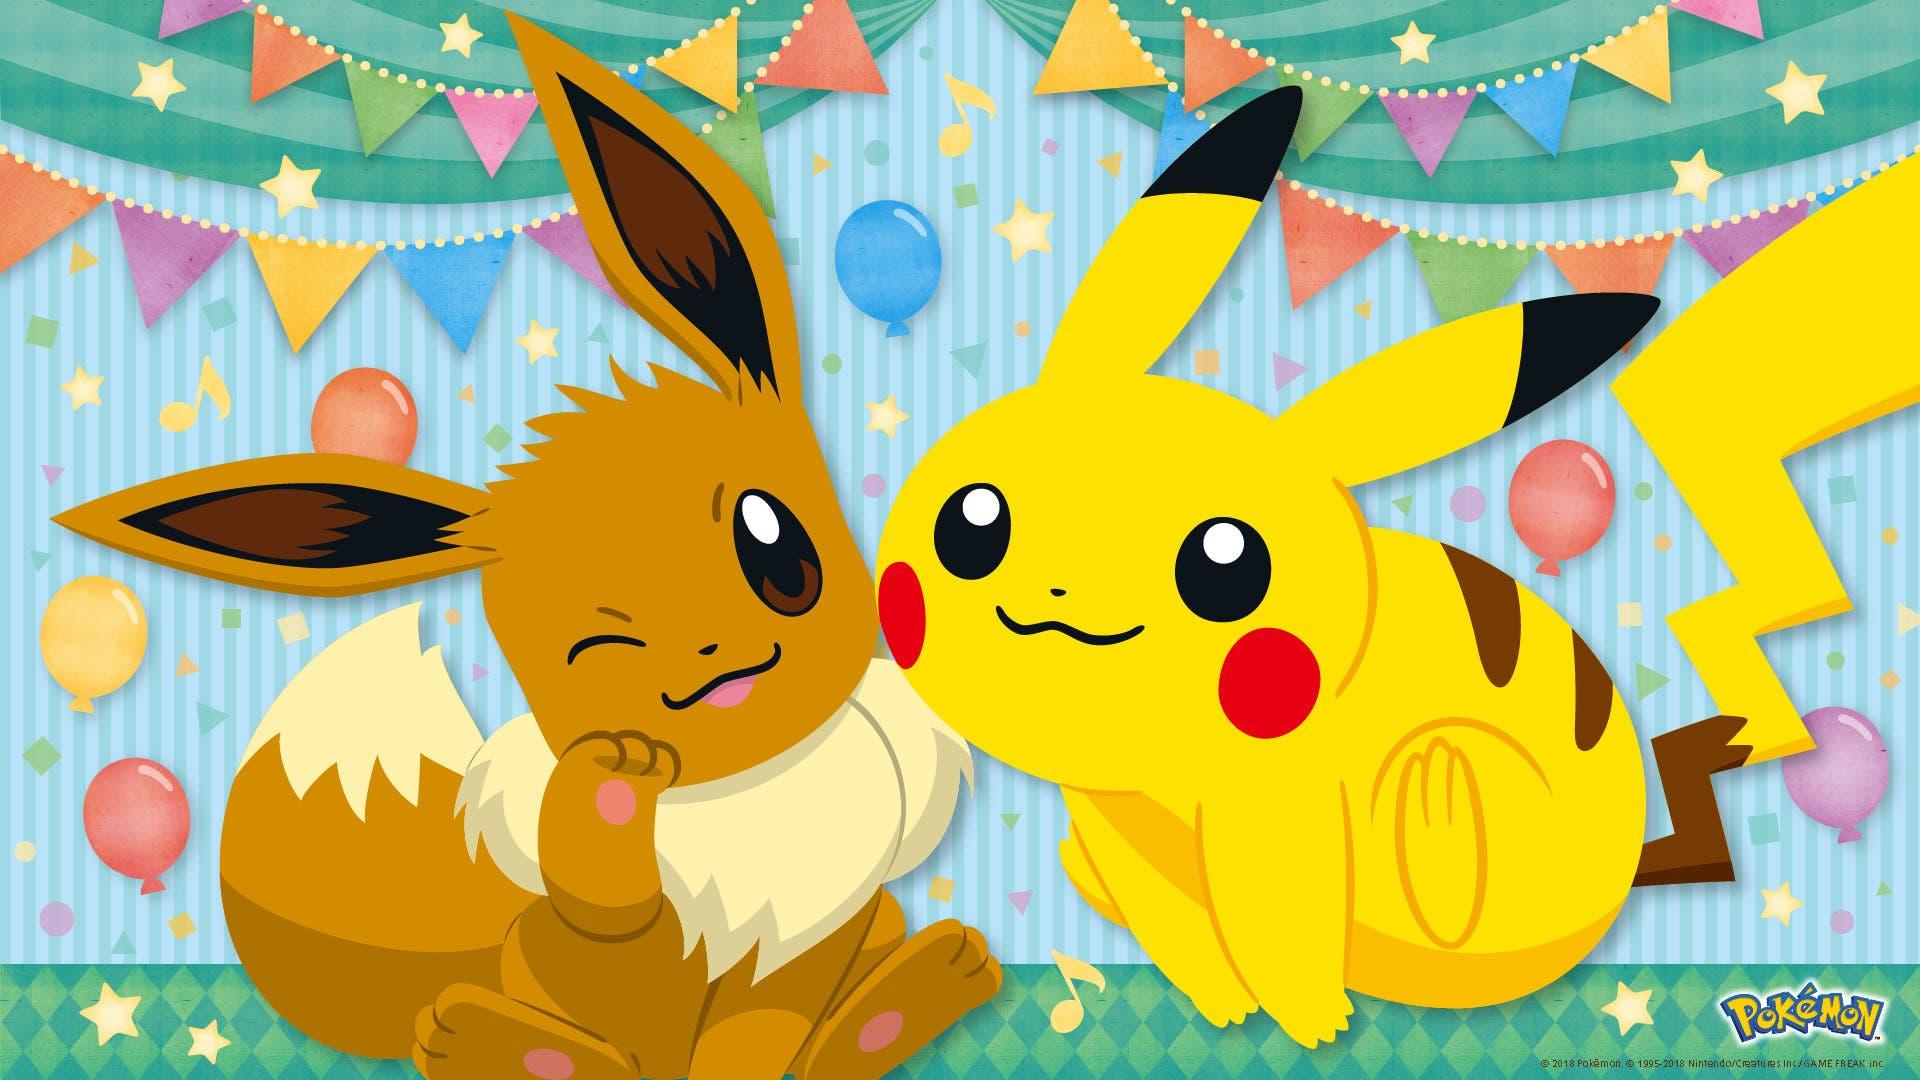 Nintendo ofrece felicitaciones temáticas protagonizadas por Pokémon, Mario o Kirby